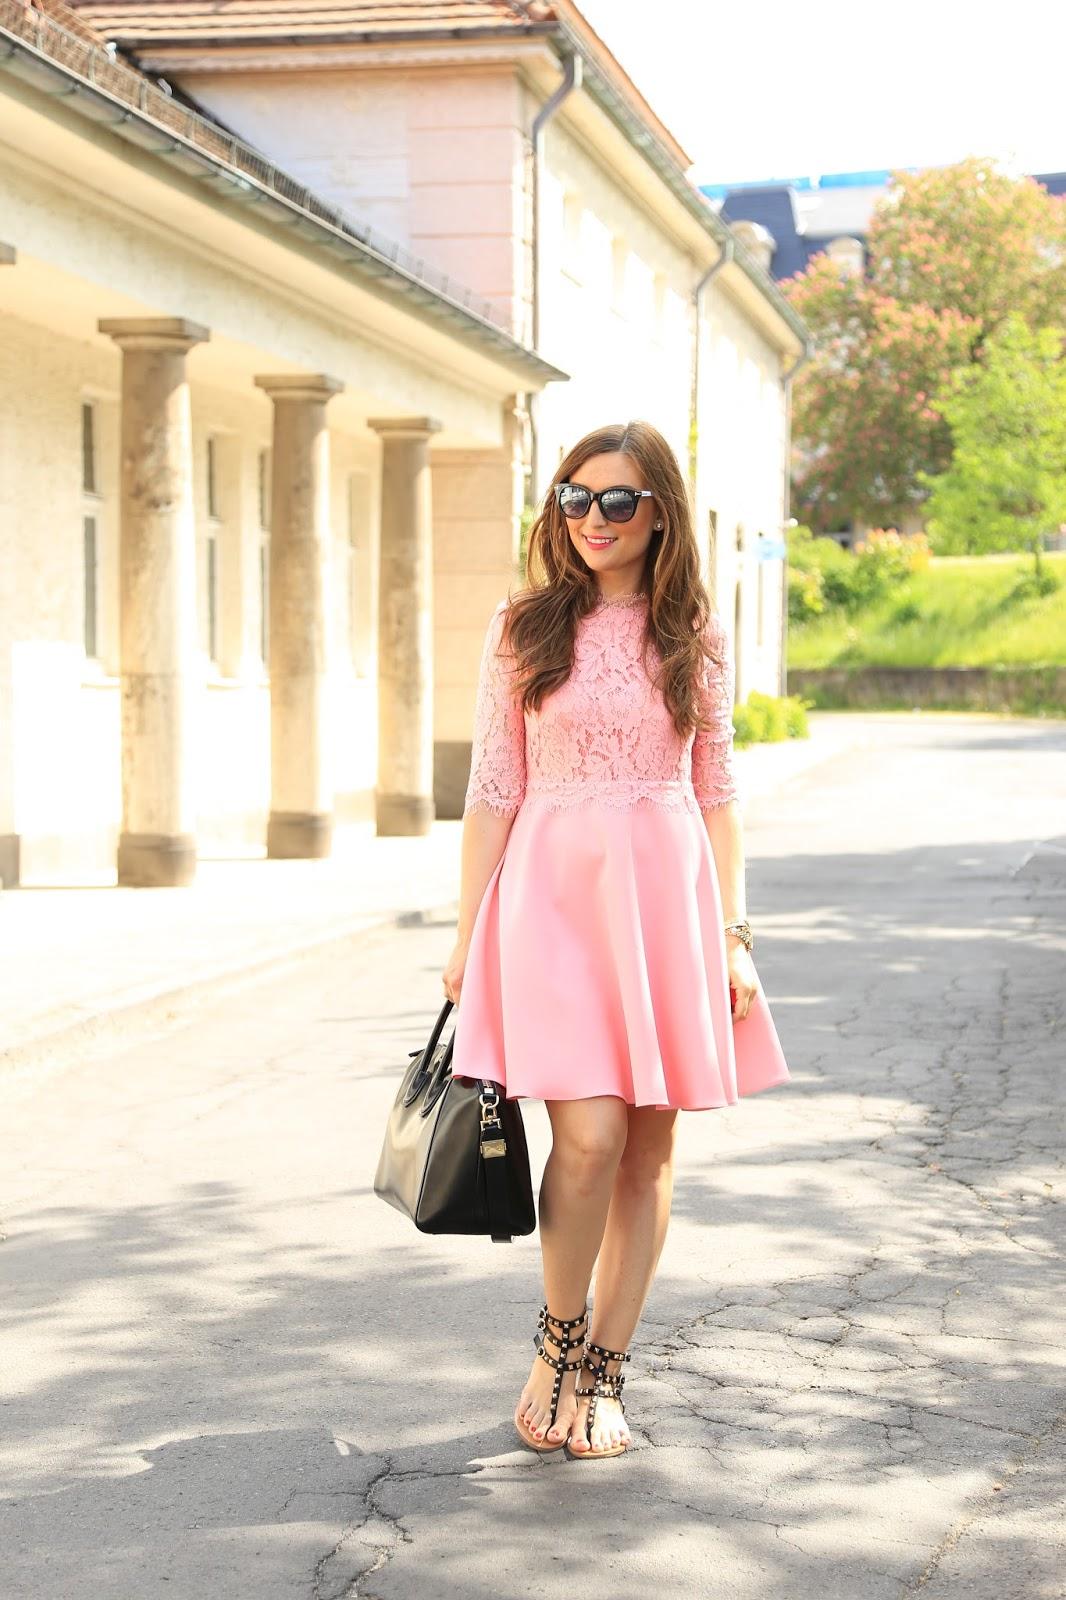 Lichi.eu Kleid - Rosa Kleid Fashionblogger - Fashionblogger aus Deutschland in Lichi- Fashionstylebyjohanna